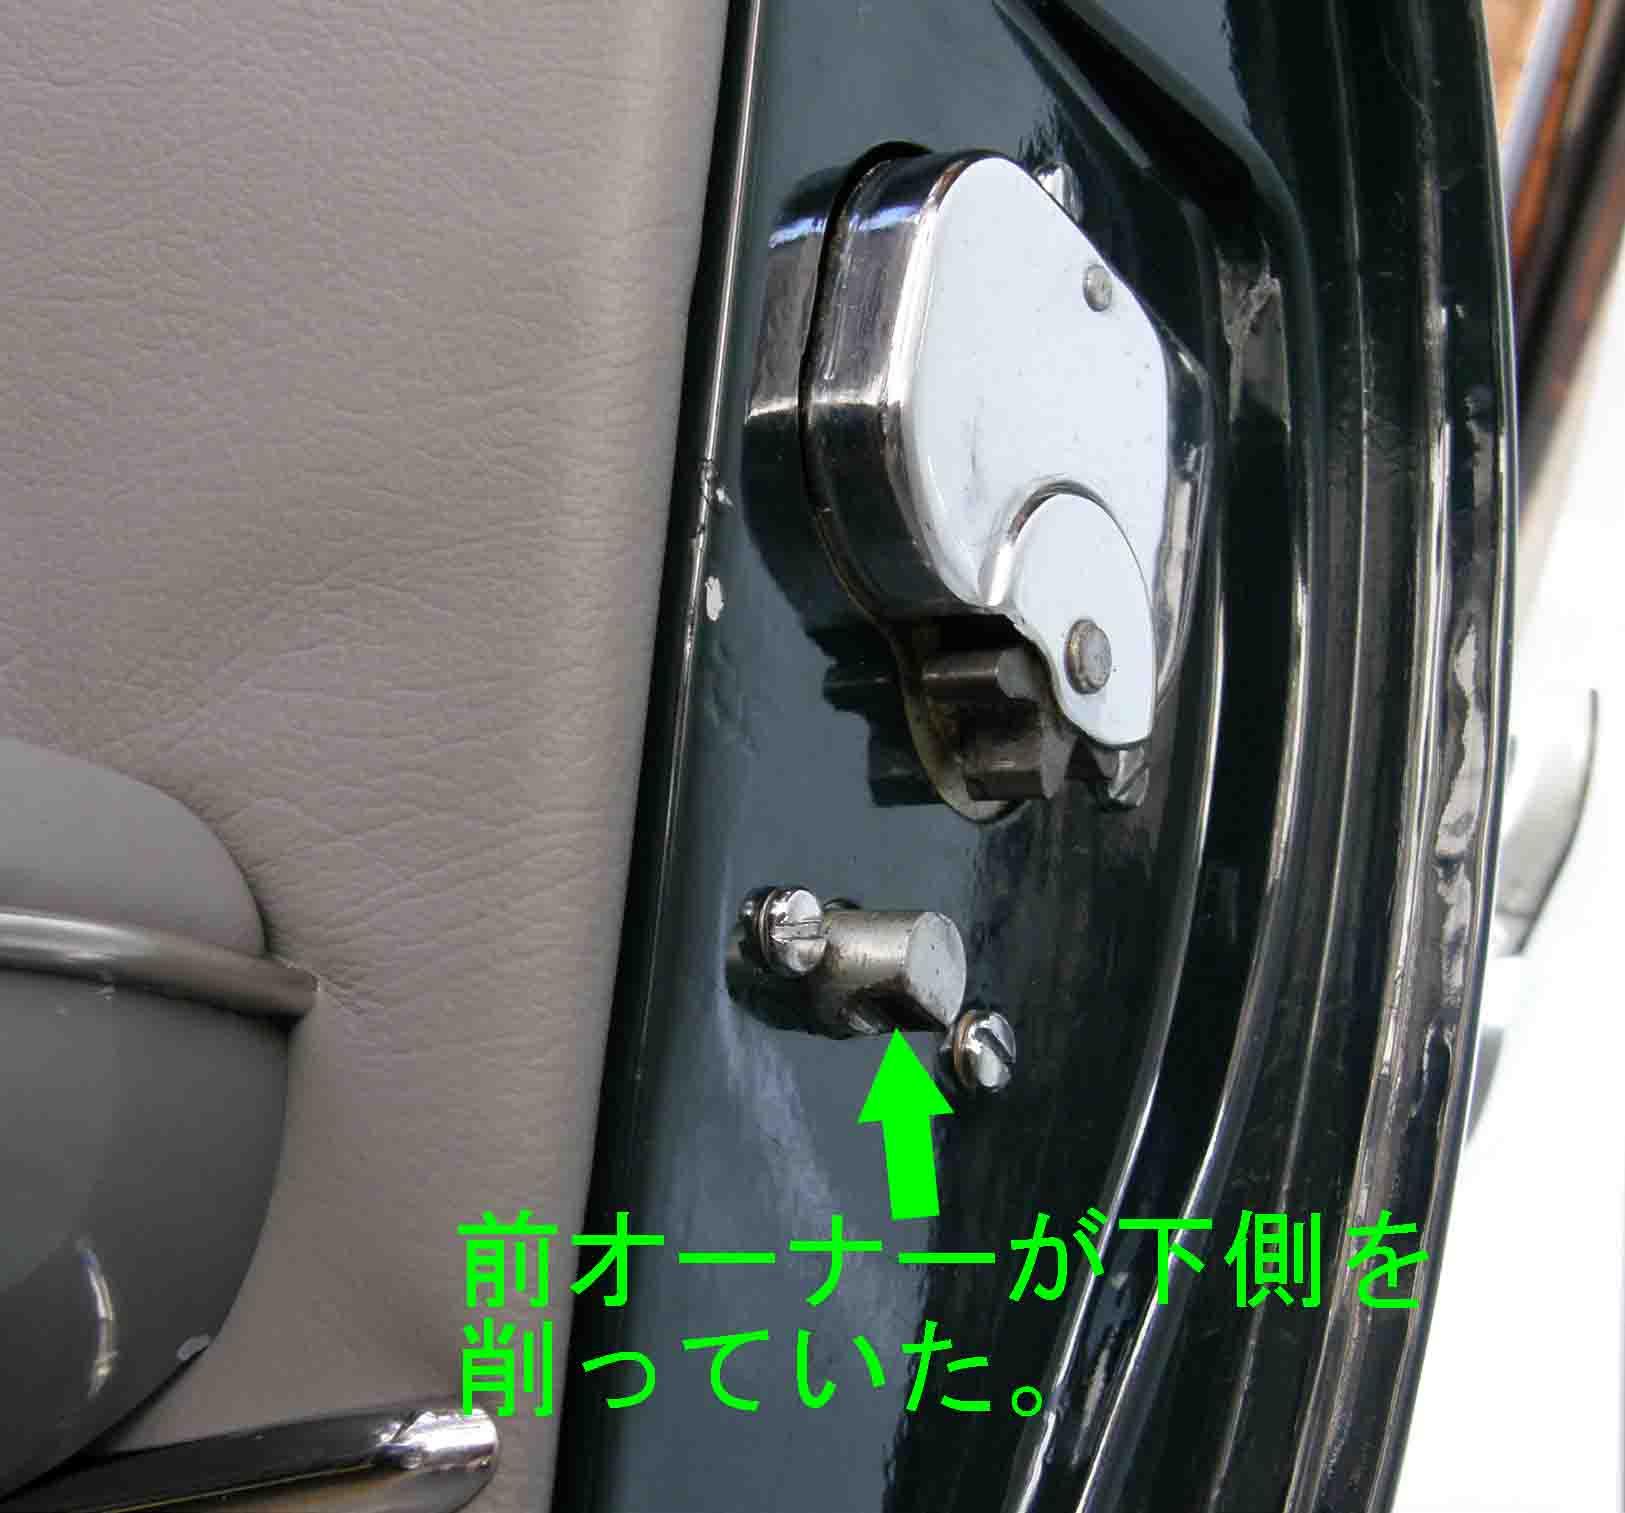 blogP7170735.jpg